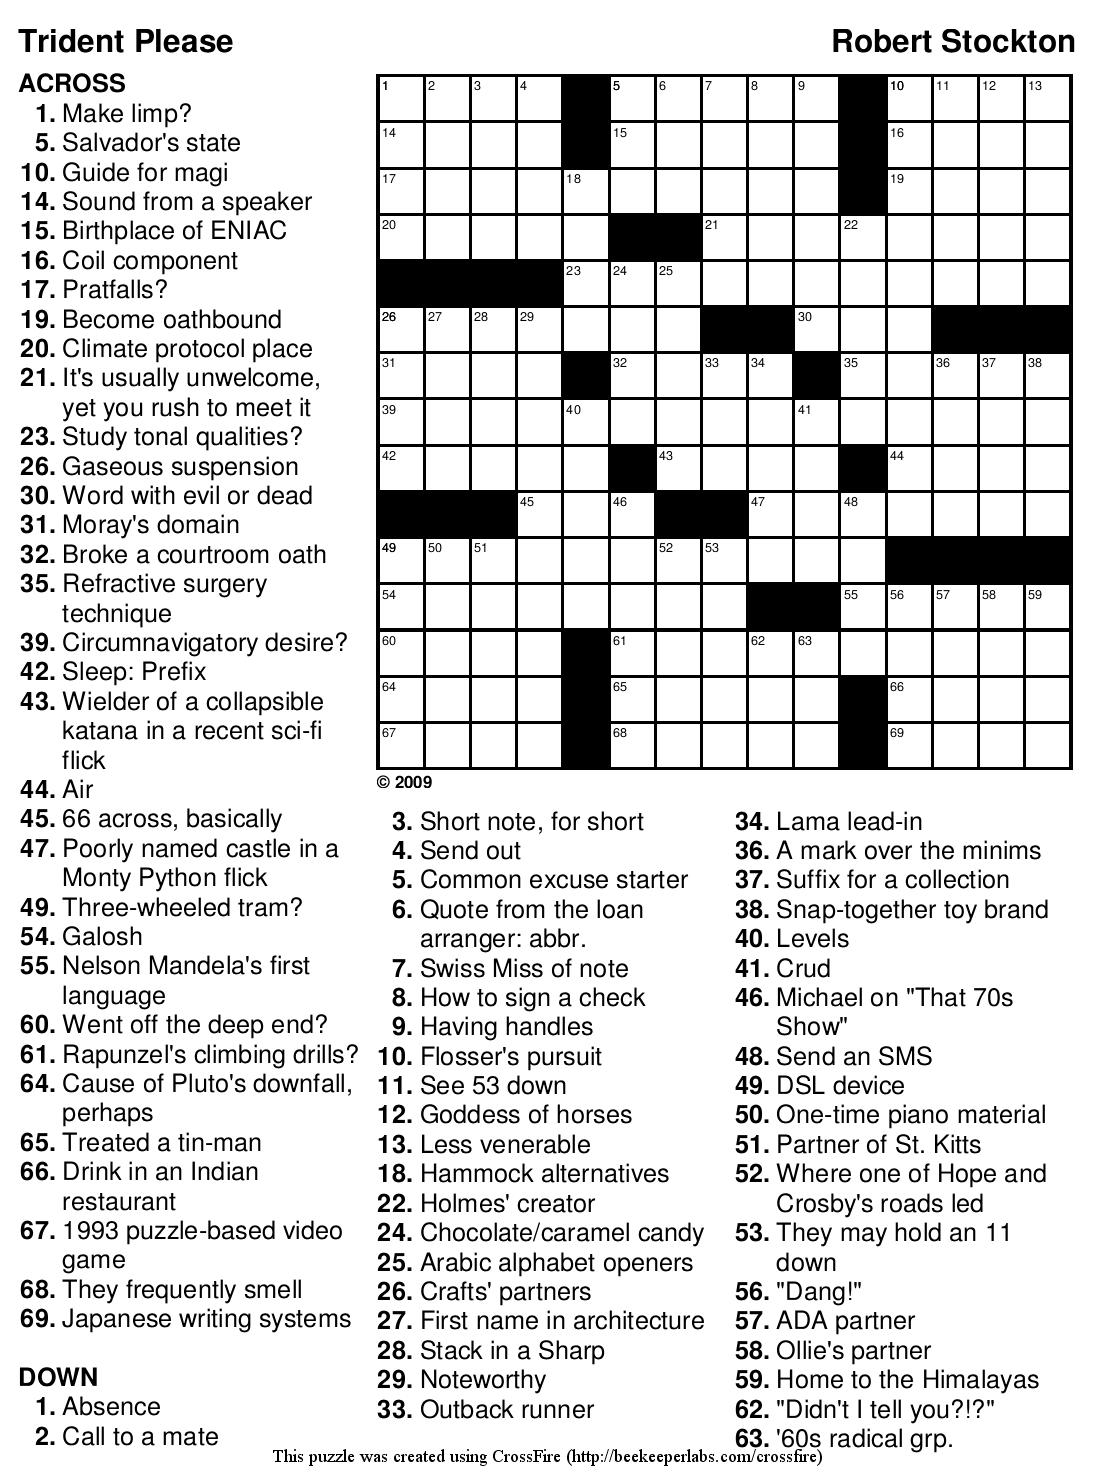 Free Printable Pop Culture Crossword Puzzles